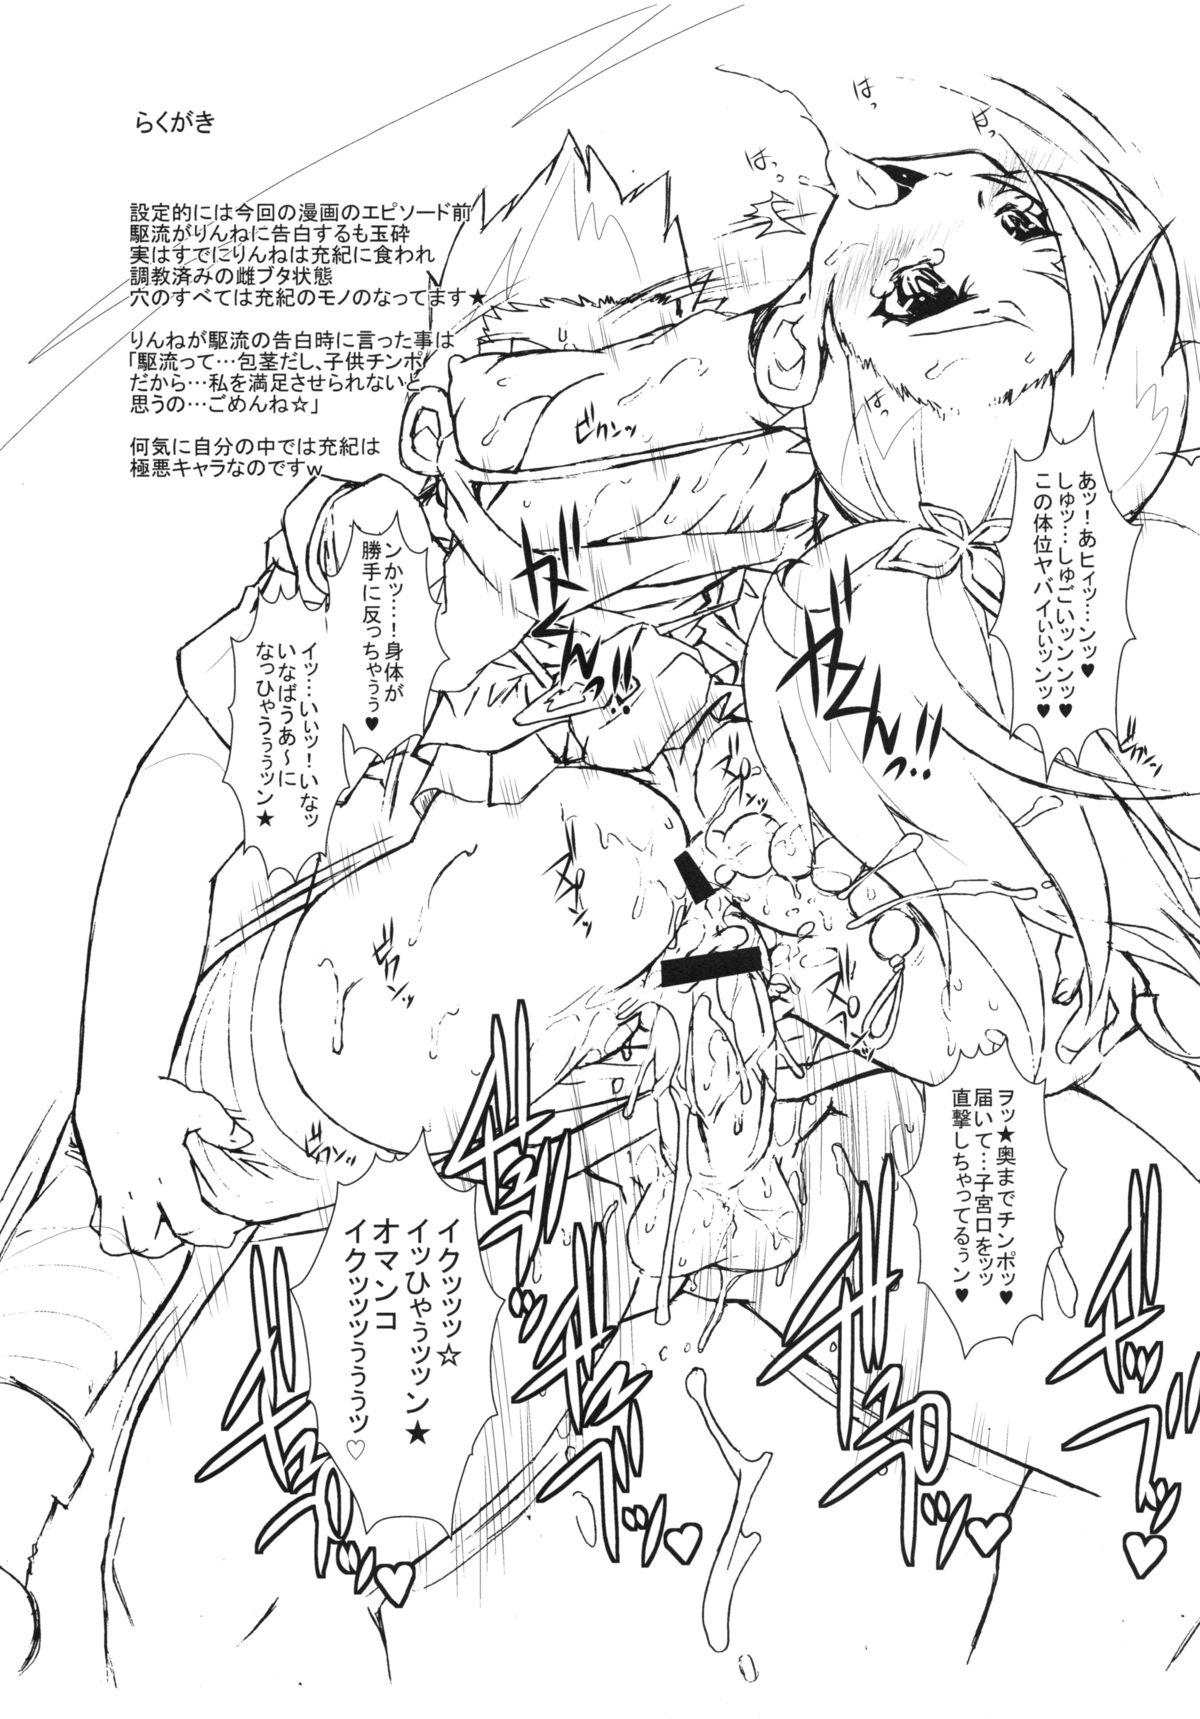 Zetubou Teki Sensei 13